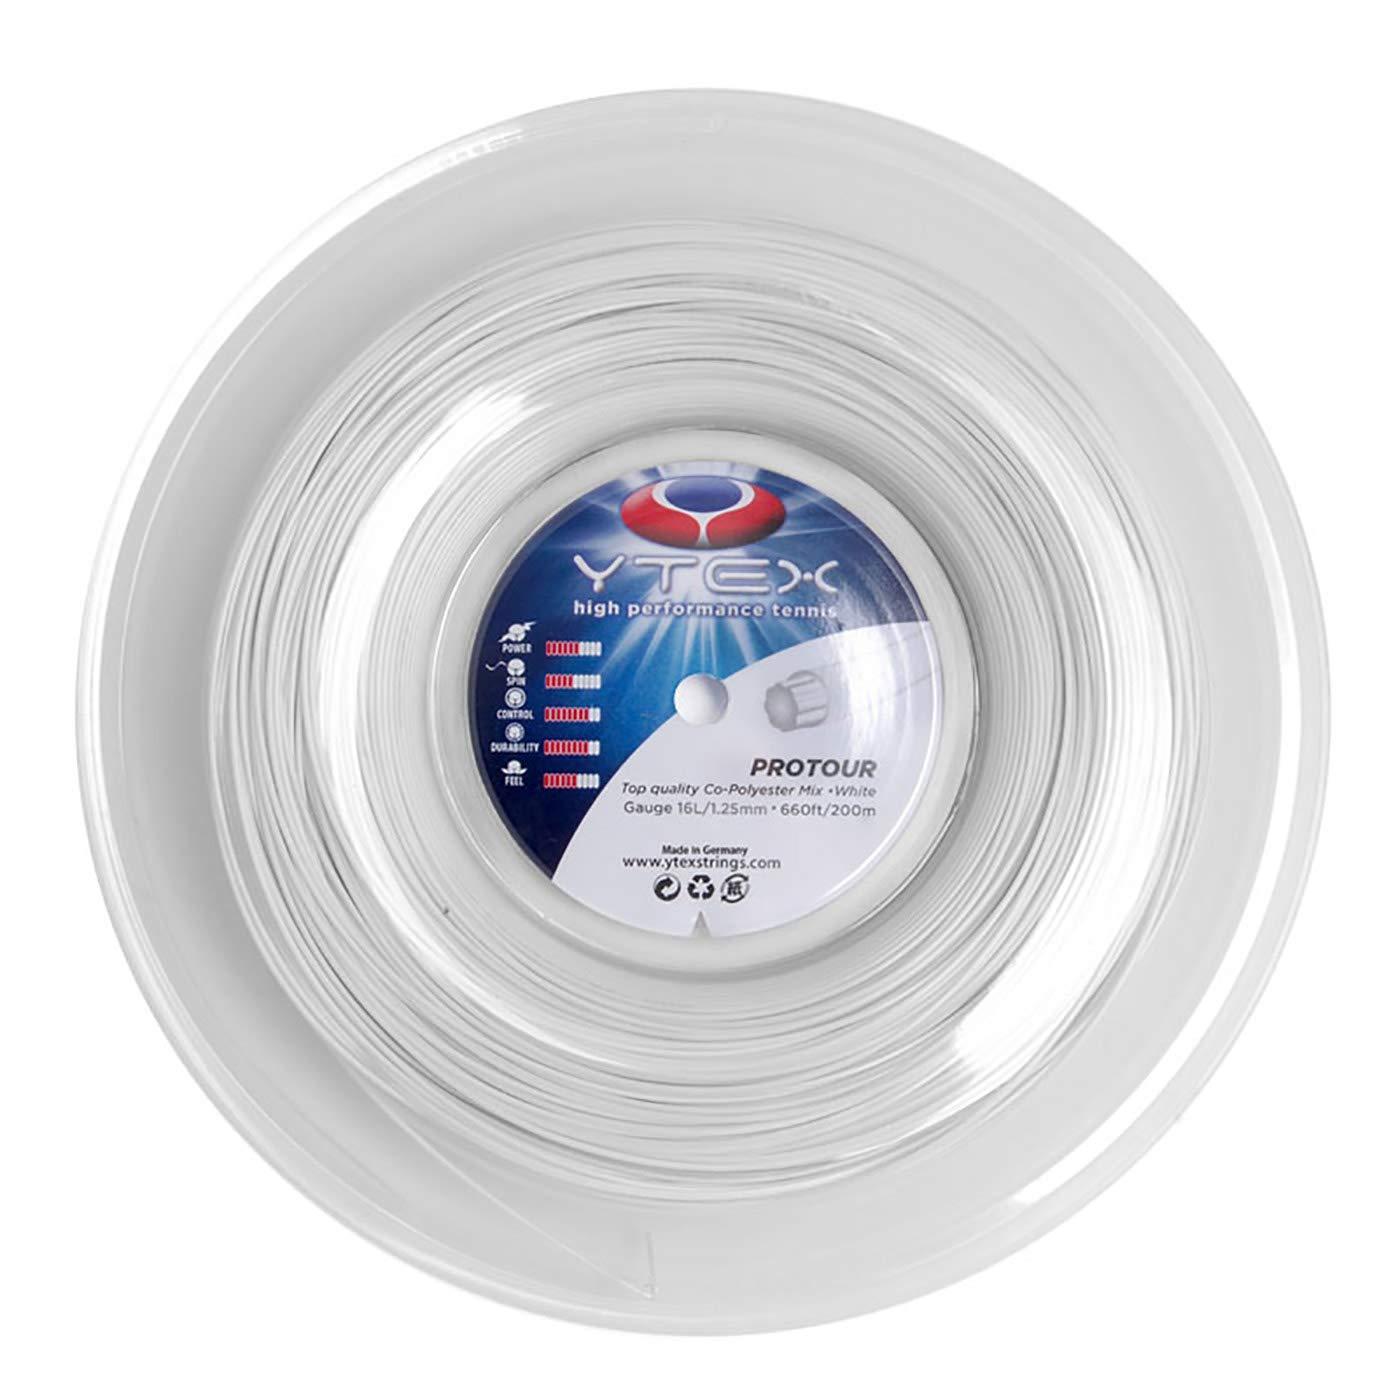 16 Gauge, 1.27mm 850169005312 YTEX Protour Orange Tennis Racquet String Reel